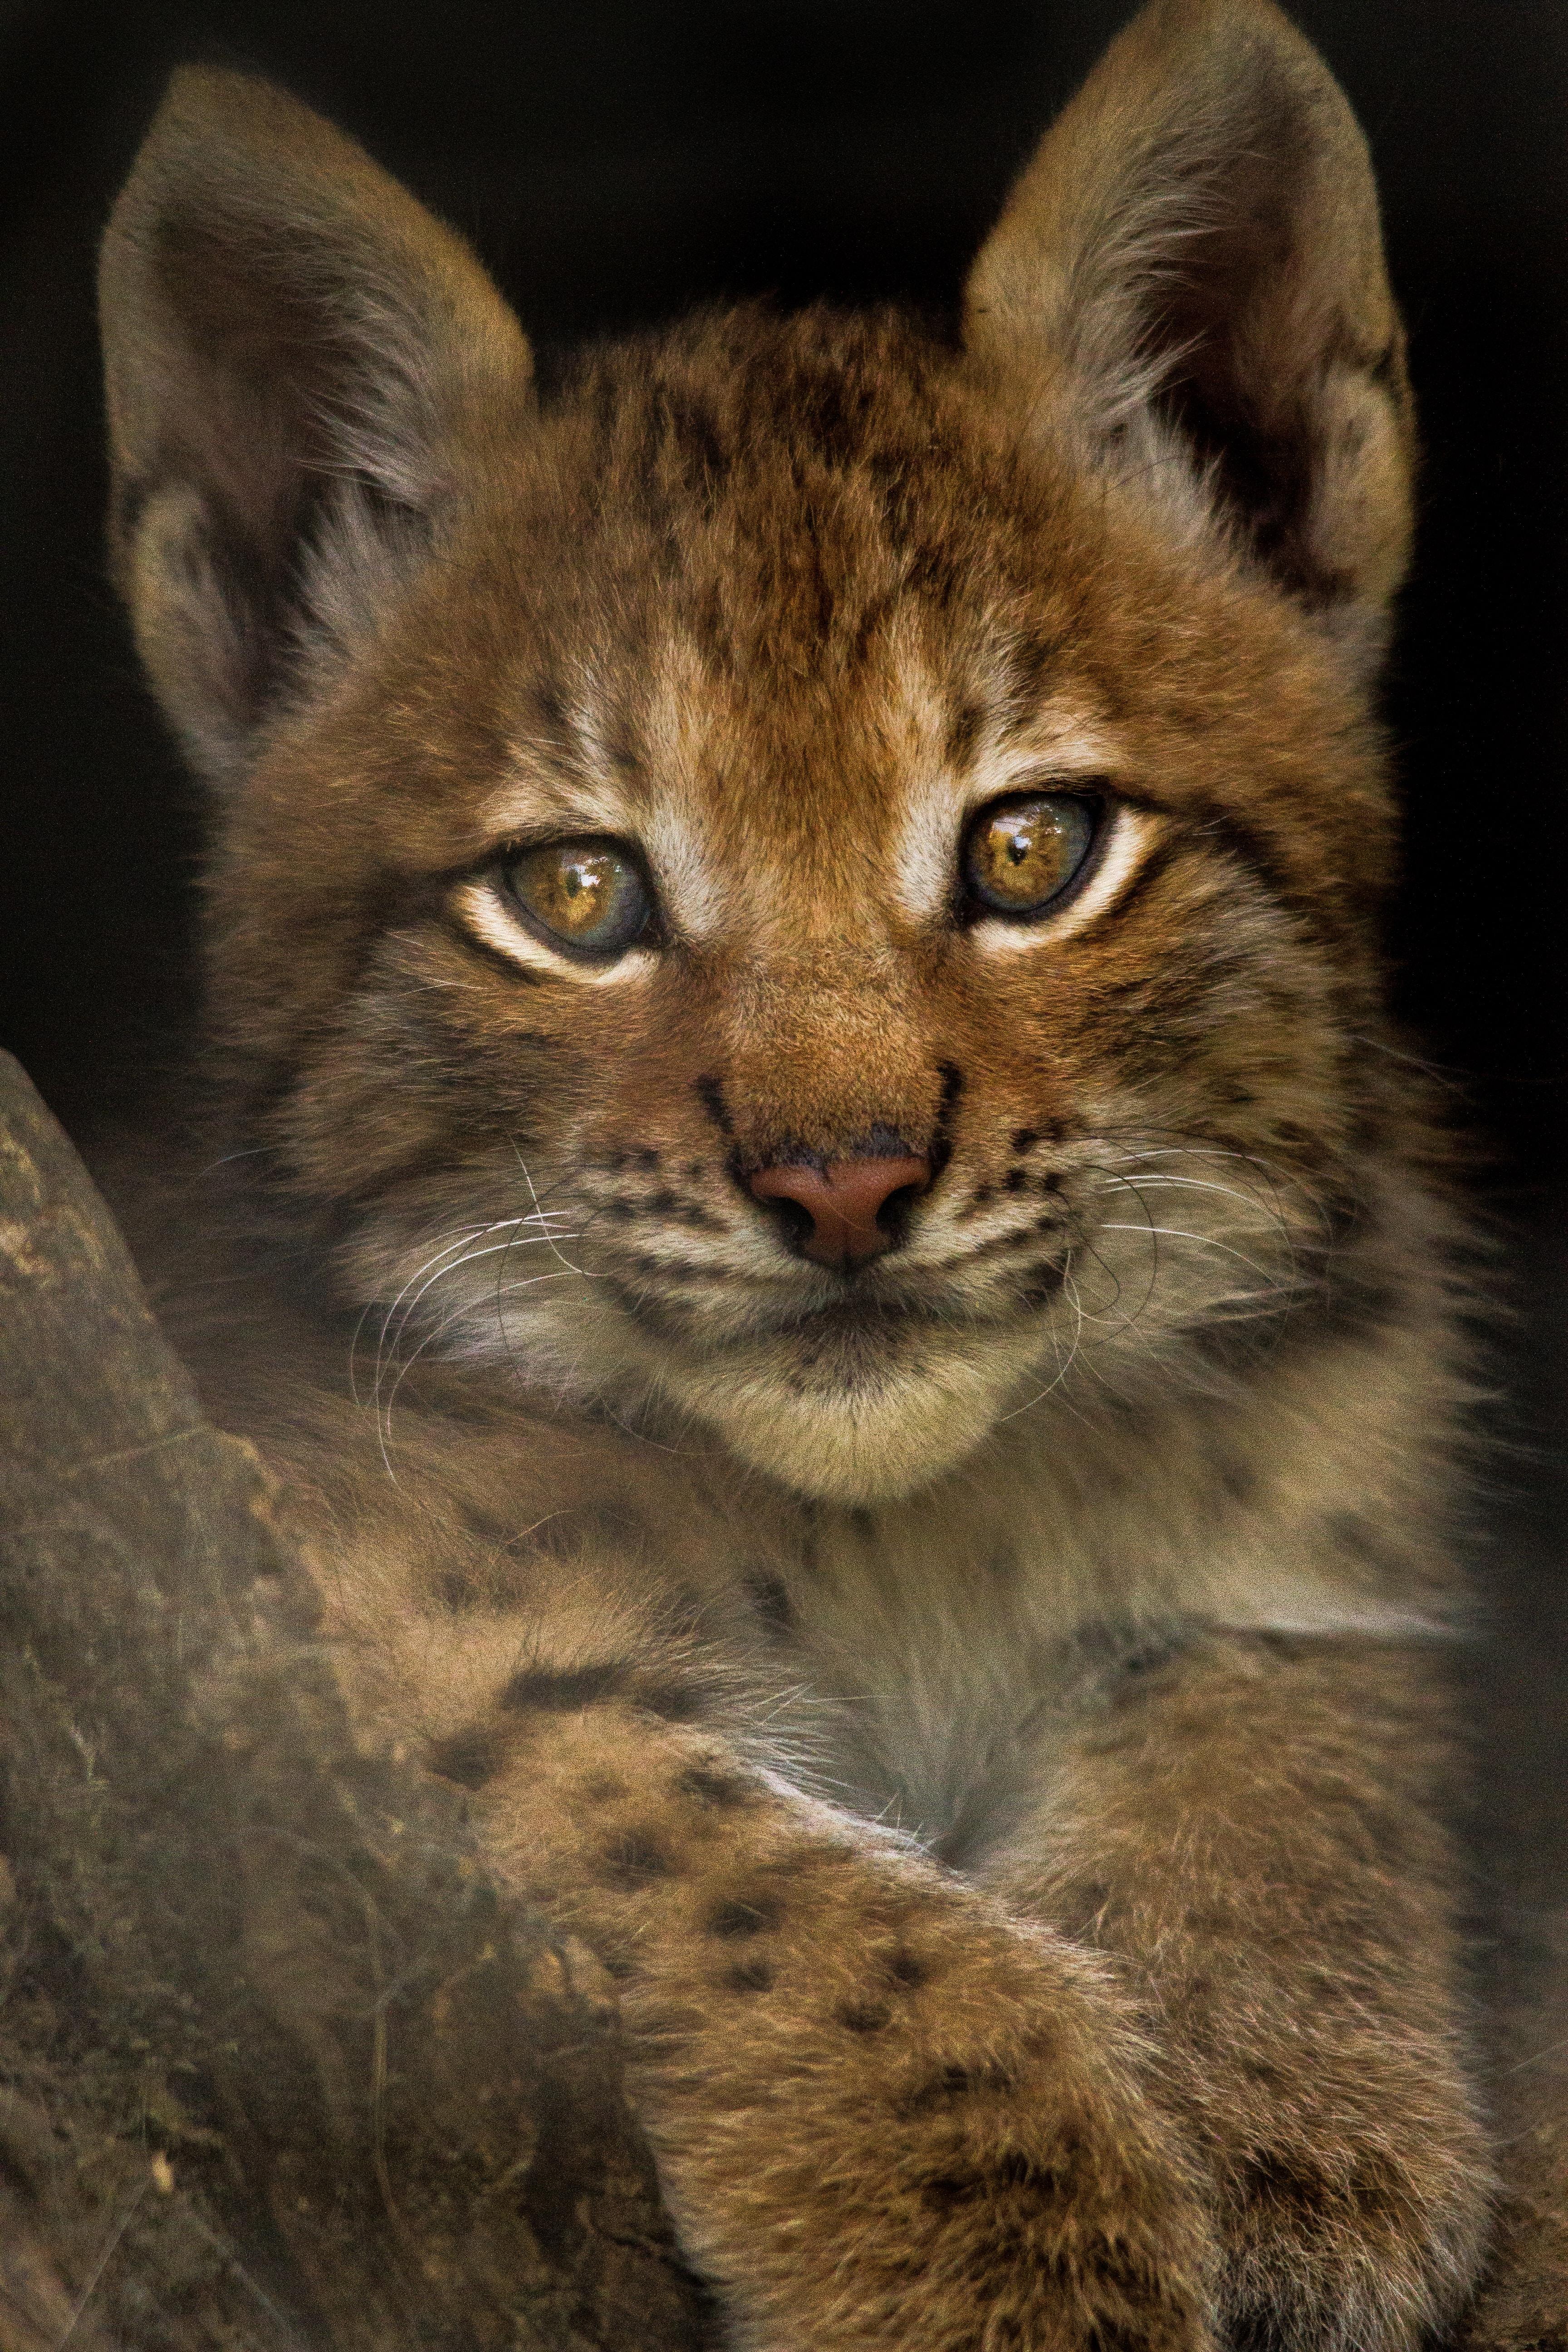 Lynx kitten at Skærup Zoo